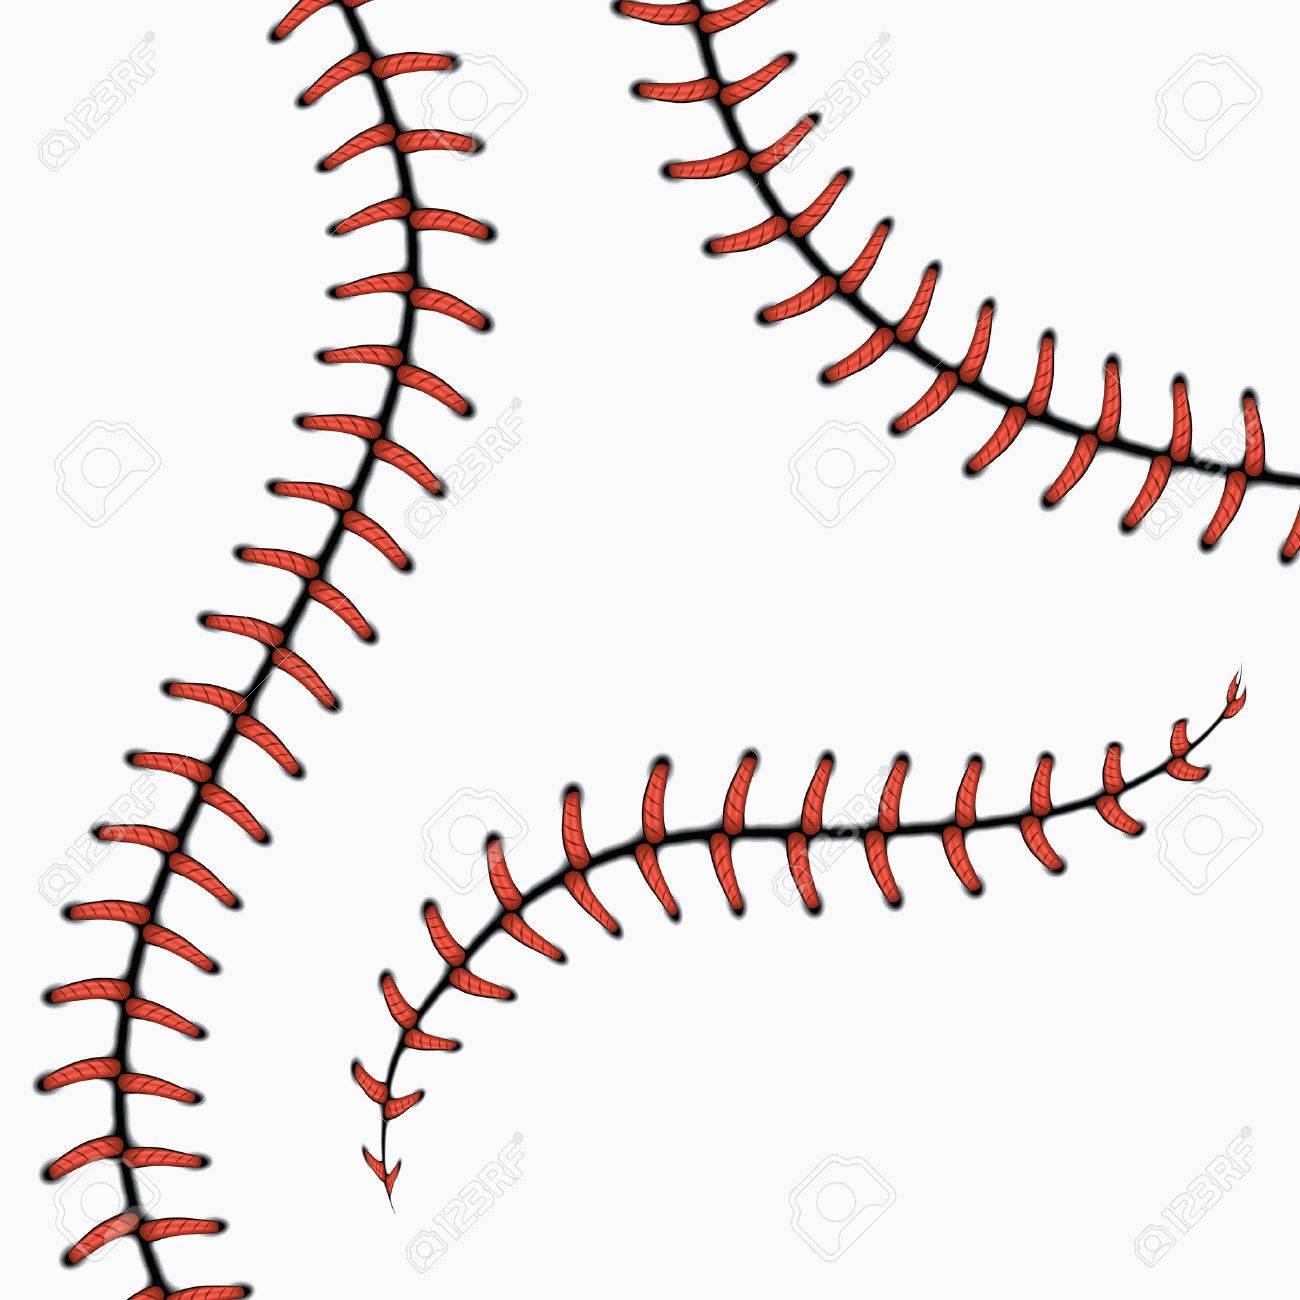 baseball stitches softball laces isolated on white vector set rh 123rf com baseball seams vector art baseball art vector